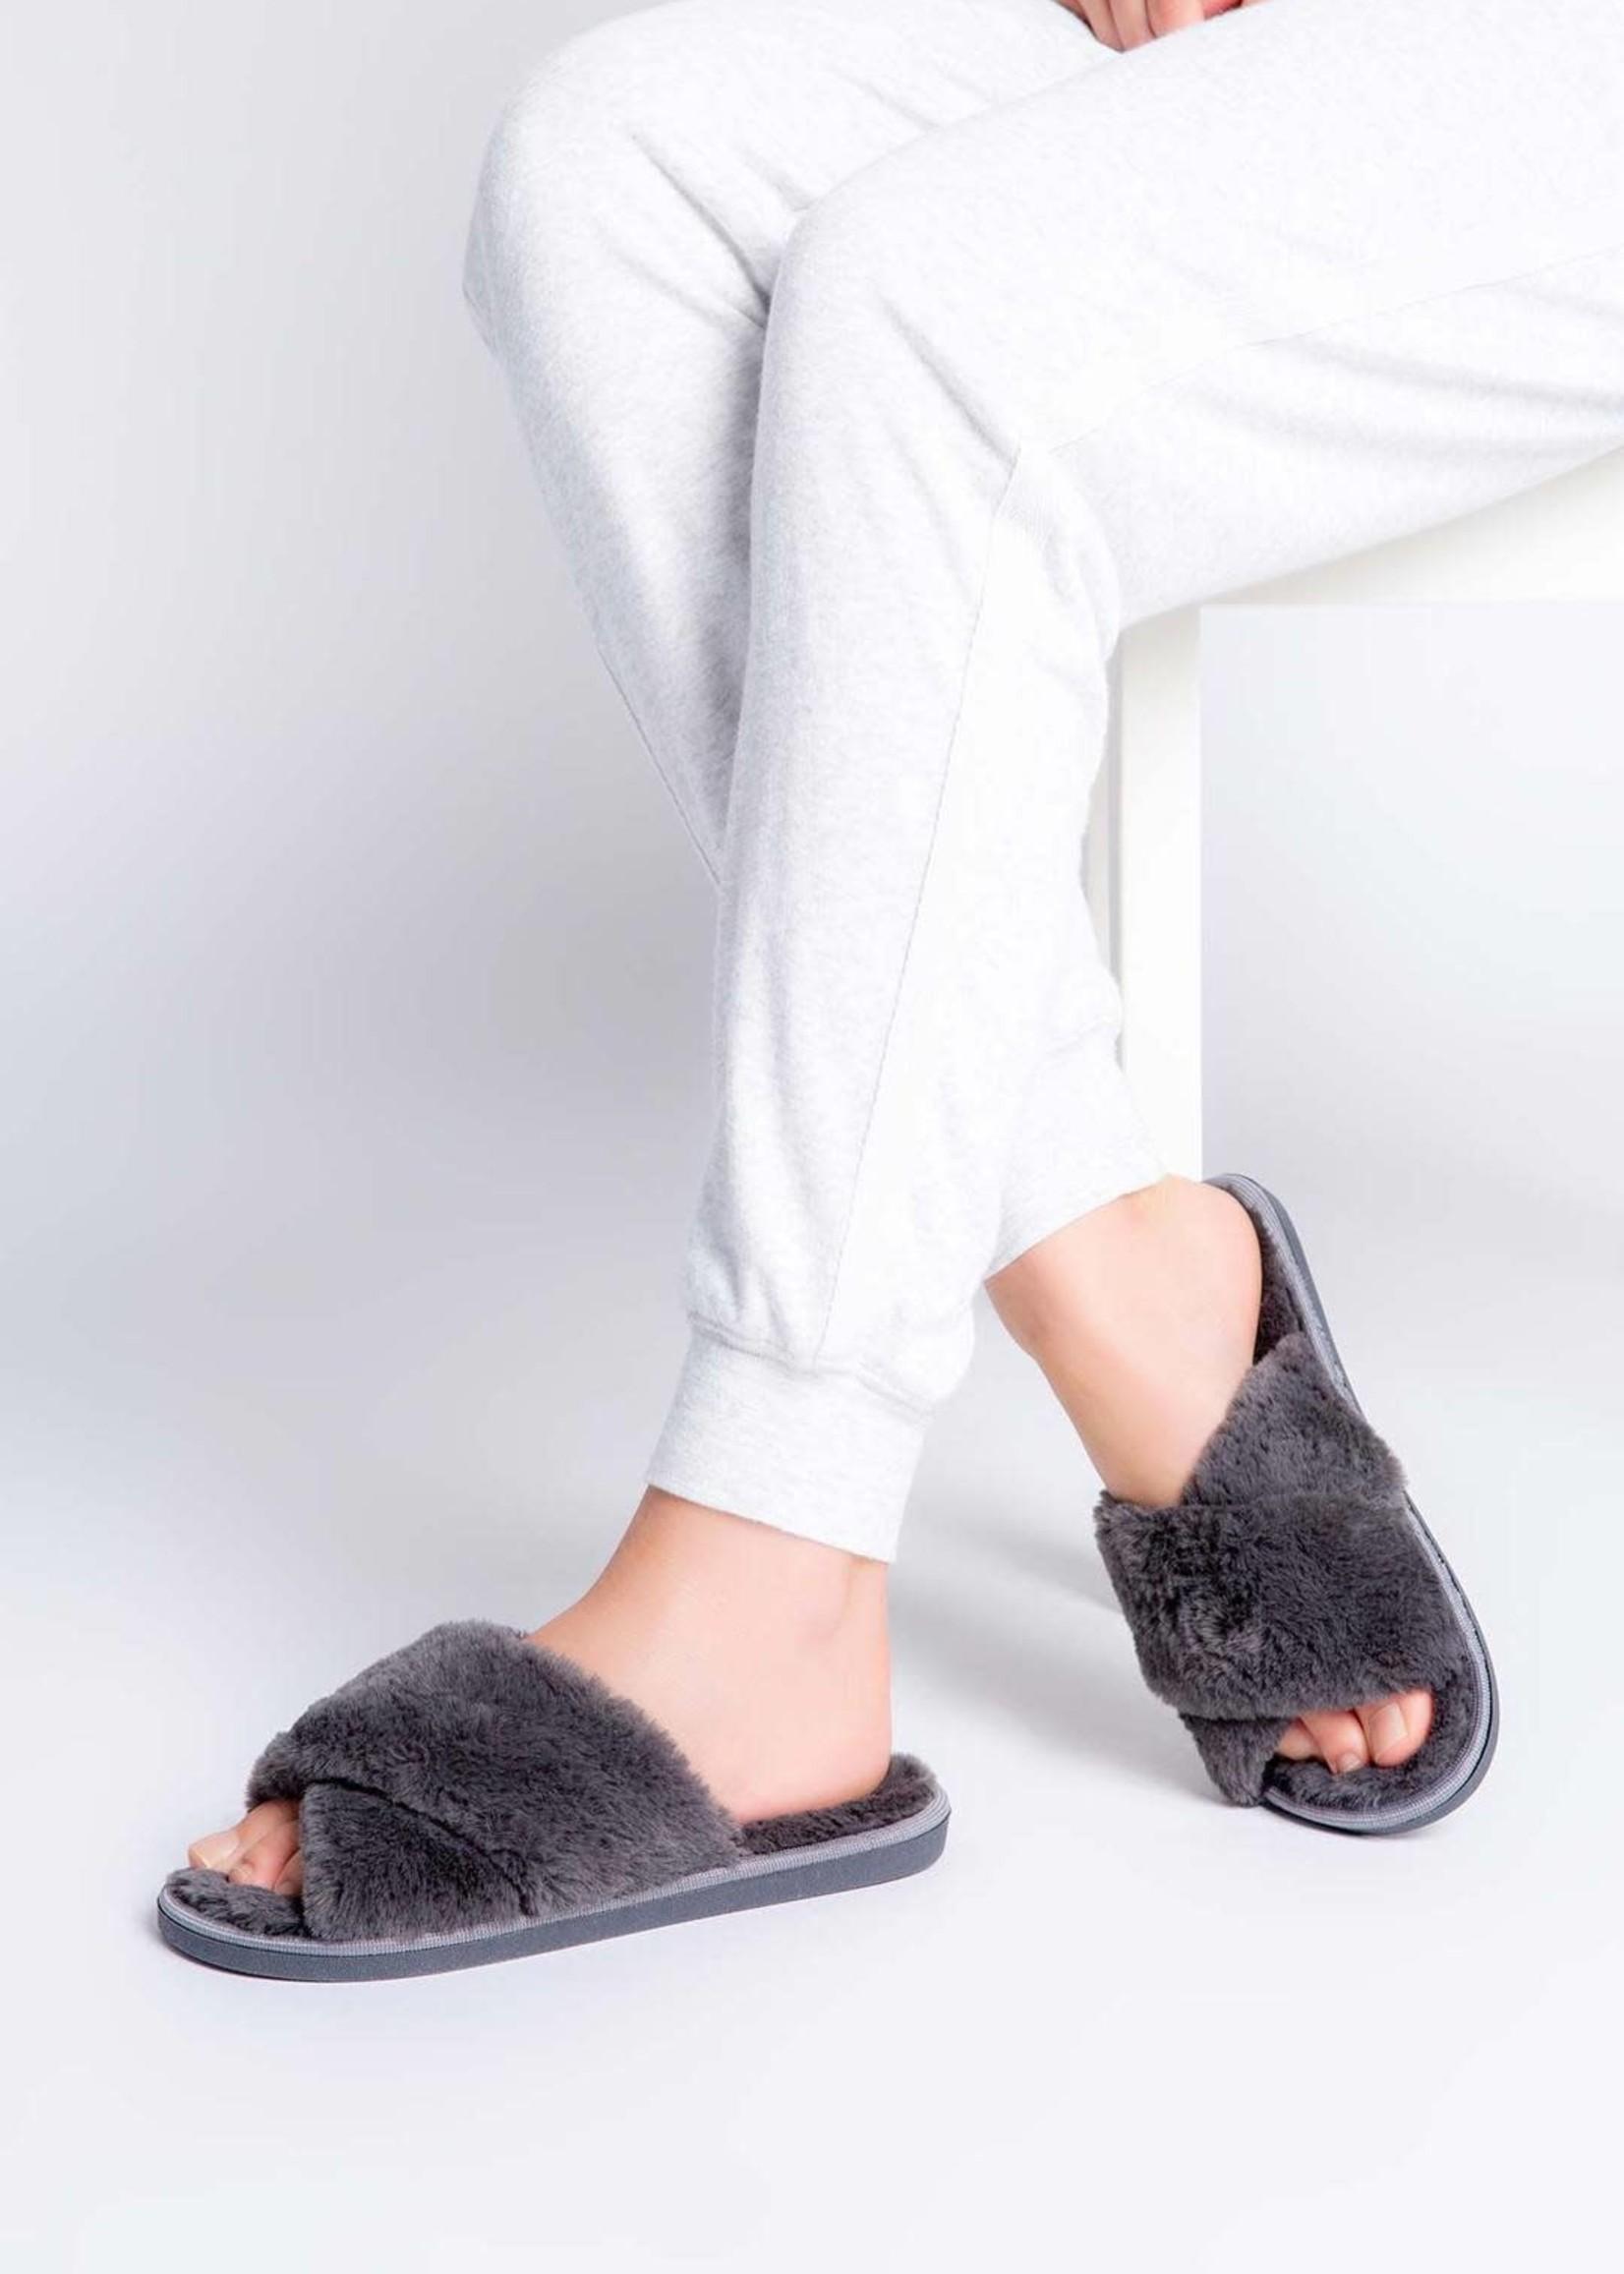 Pj slippers-grey